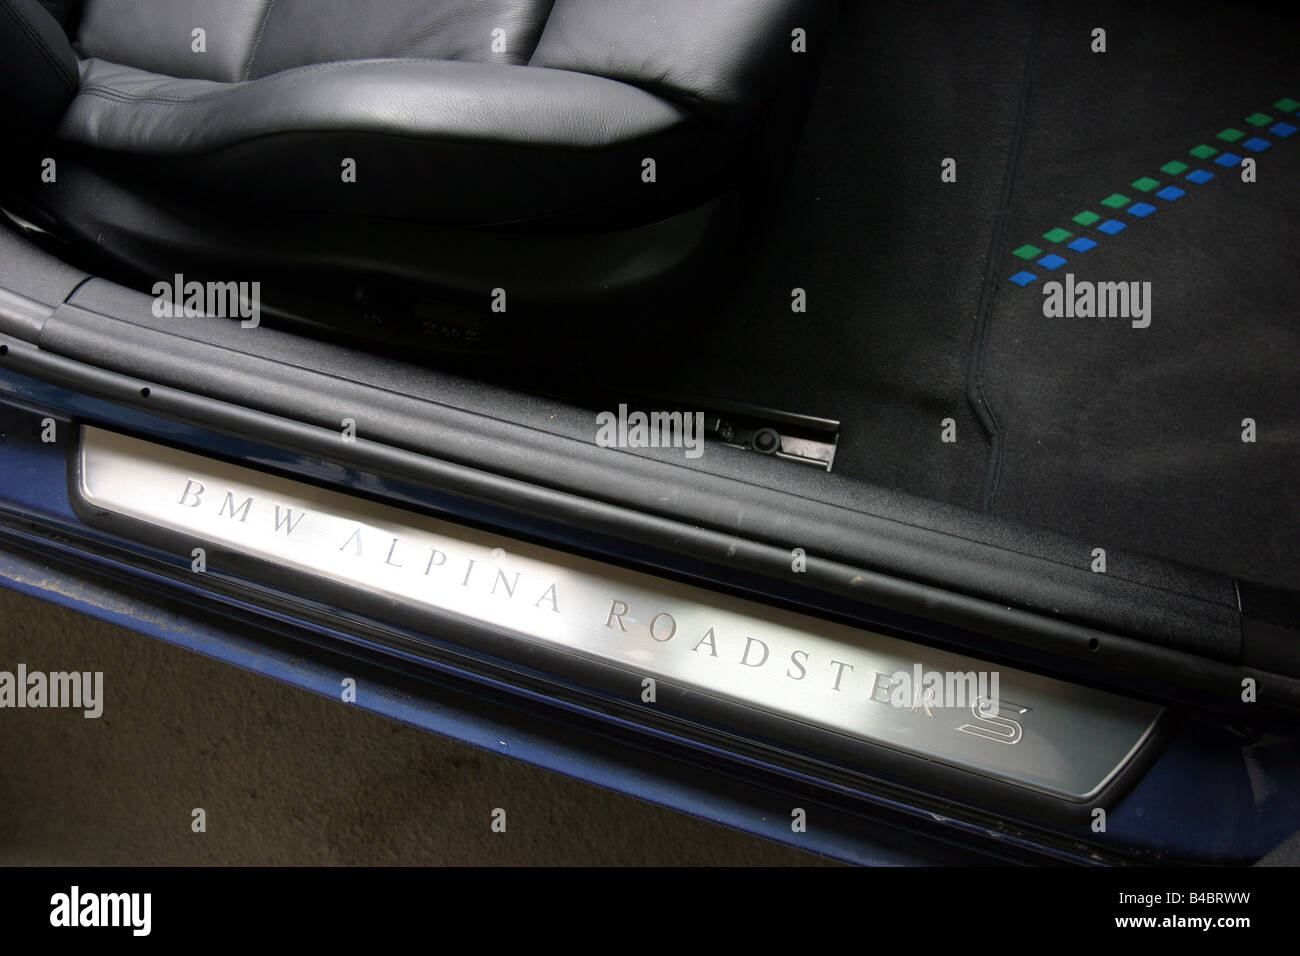 Car BMW Alpina Roadster S Alpina Z S Convertible Stock - Bmw alpina accessories